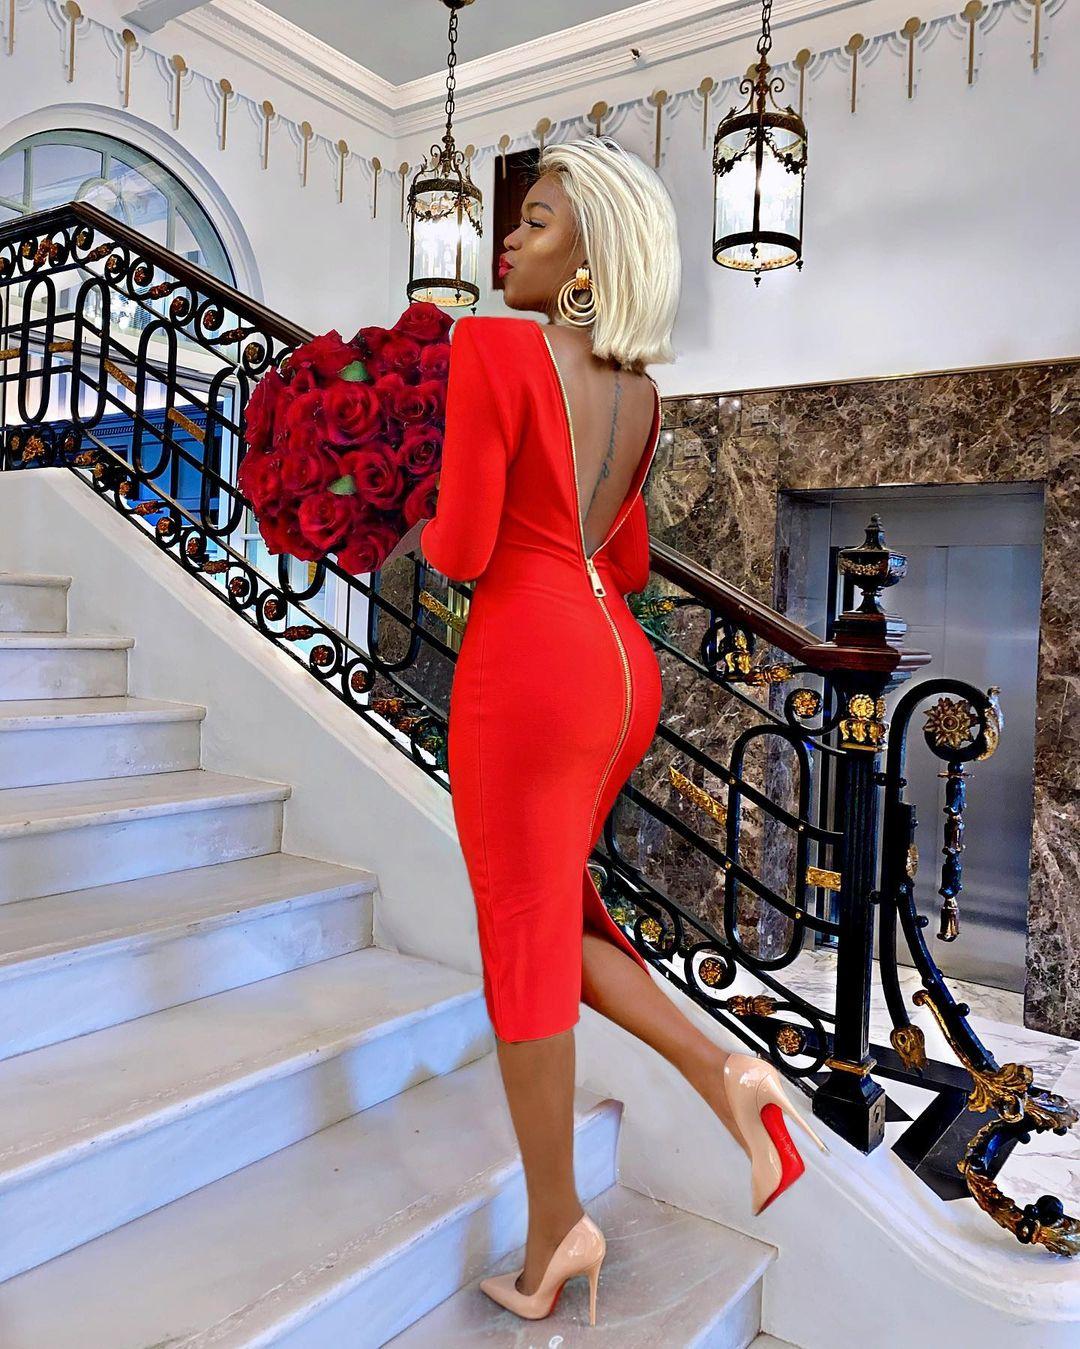 Marii Pazz Slays In Stunning Red